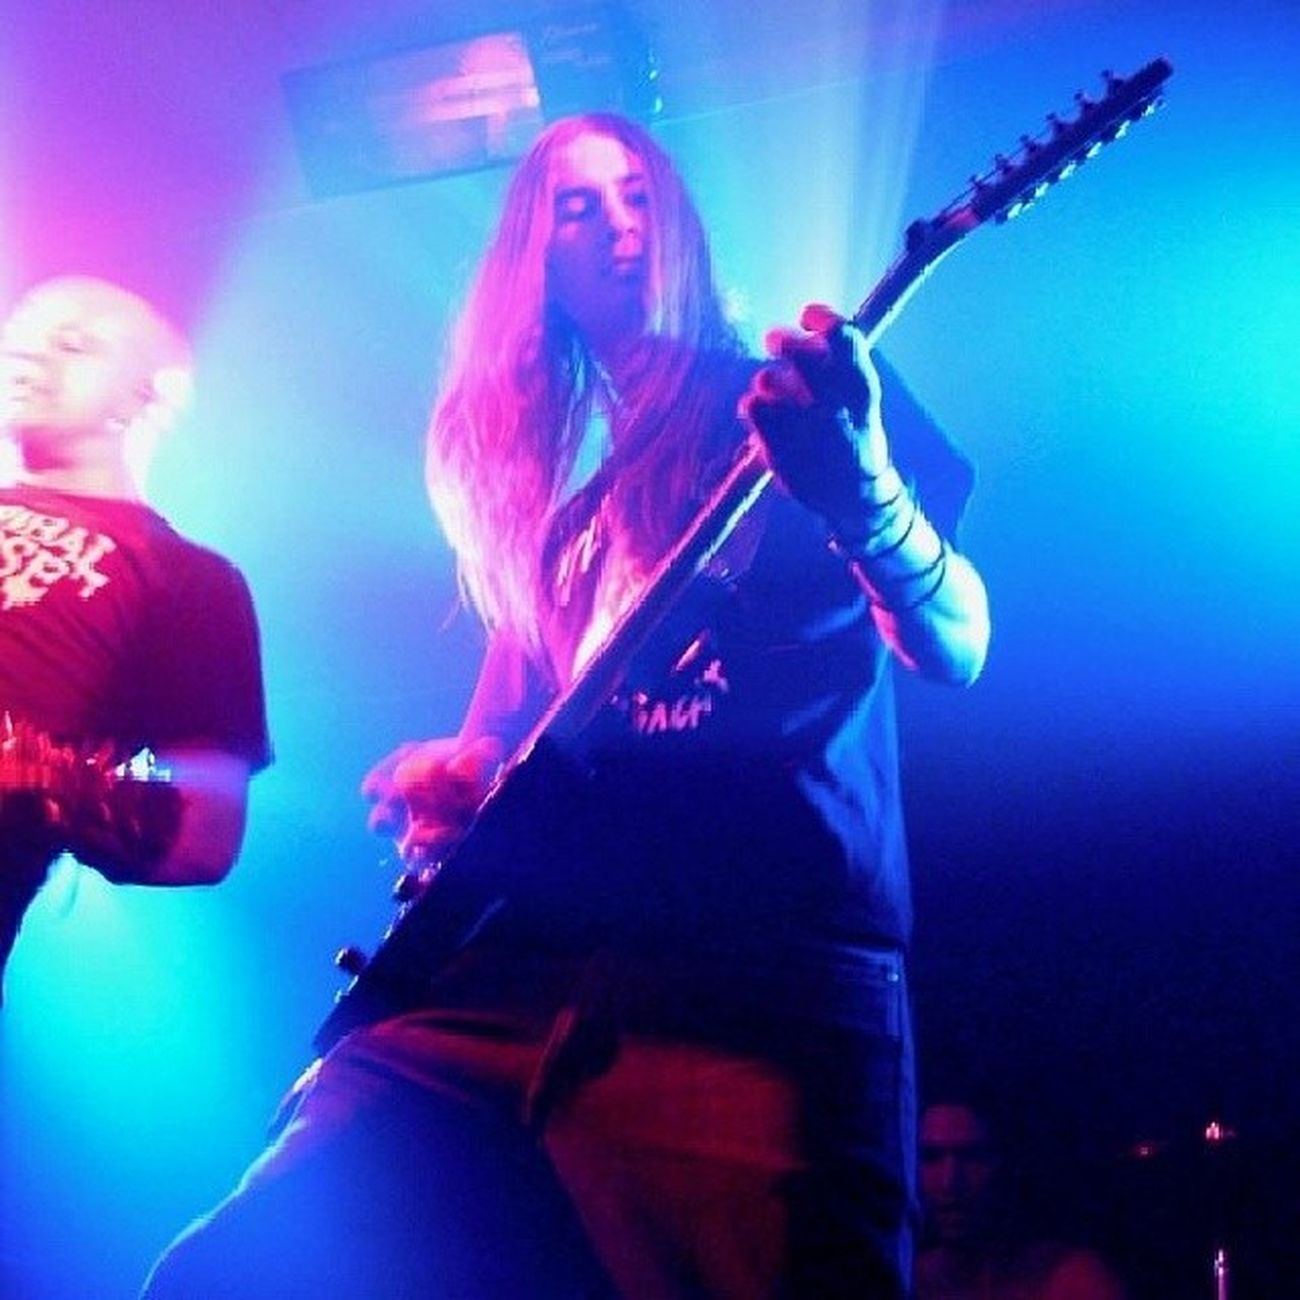 Metal Blackmetal Deathmetal Longhairedguys Longhair Guitarist Me Bands